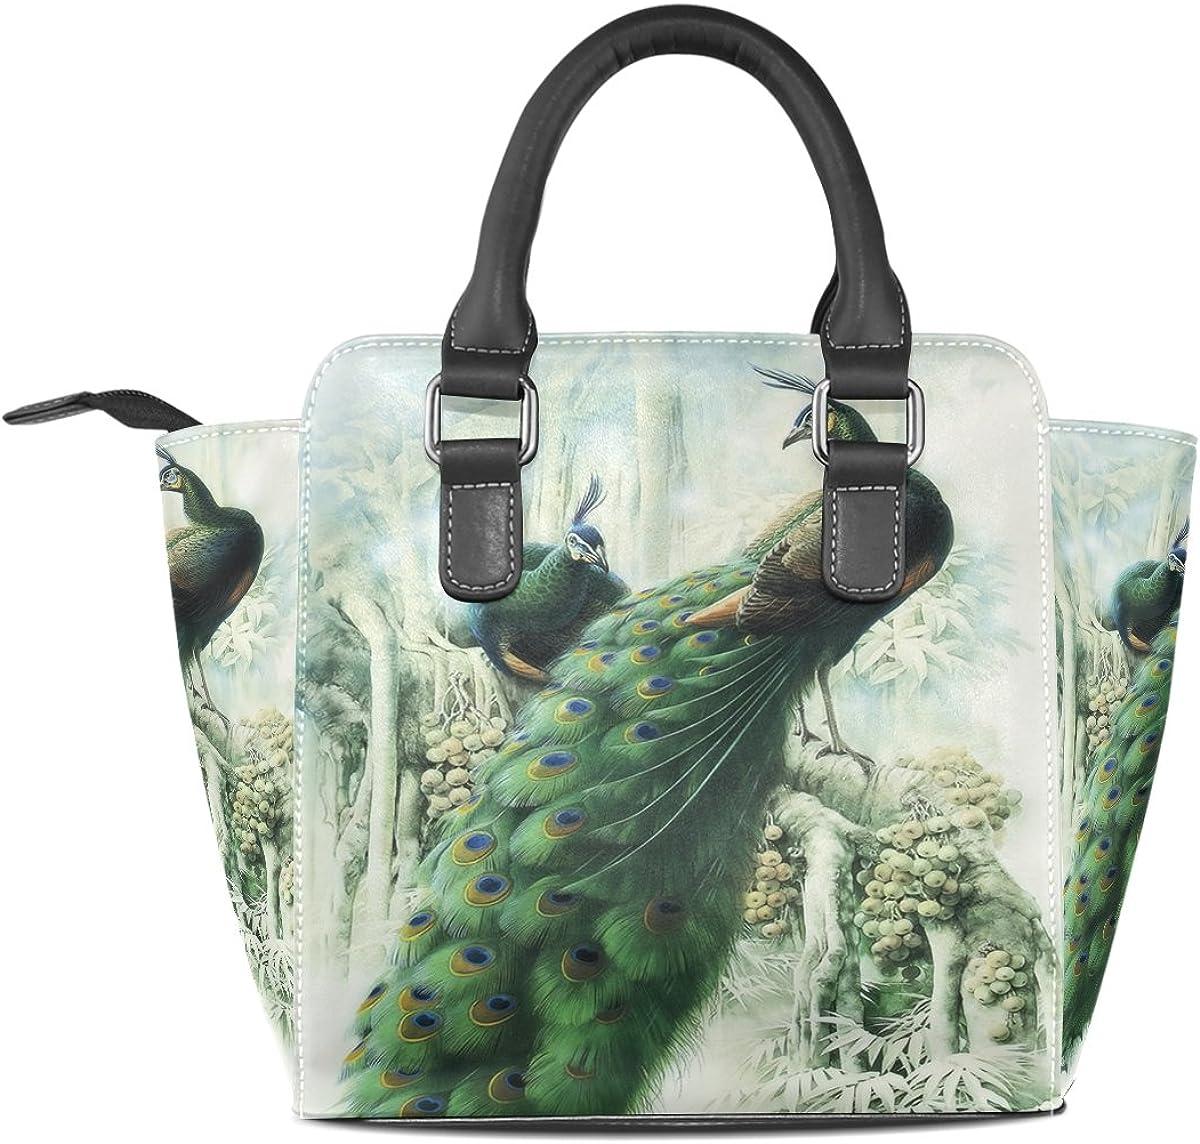 Jennifer PU Leather Top-Handle Handbags Graceful Peacocks Single-Shoulder Tote Crossbody Bag Messenger Bags For Women